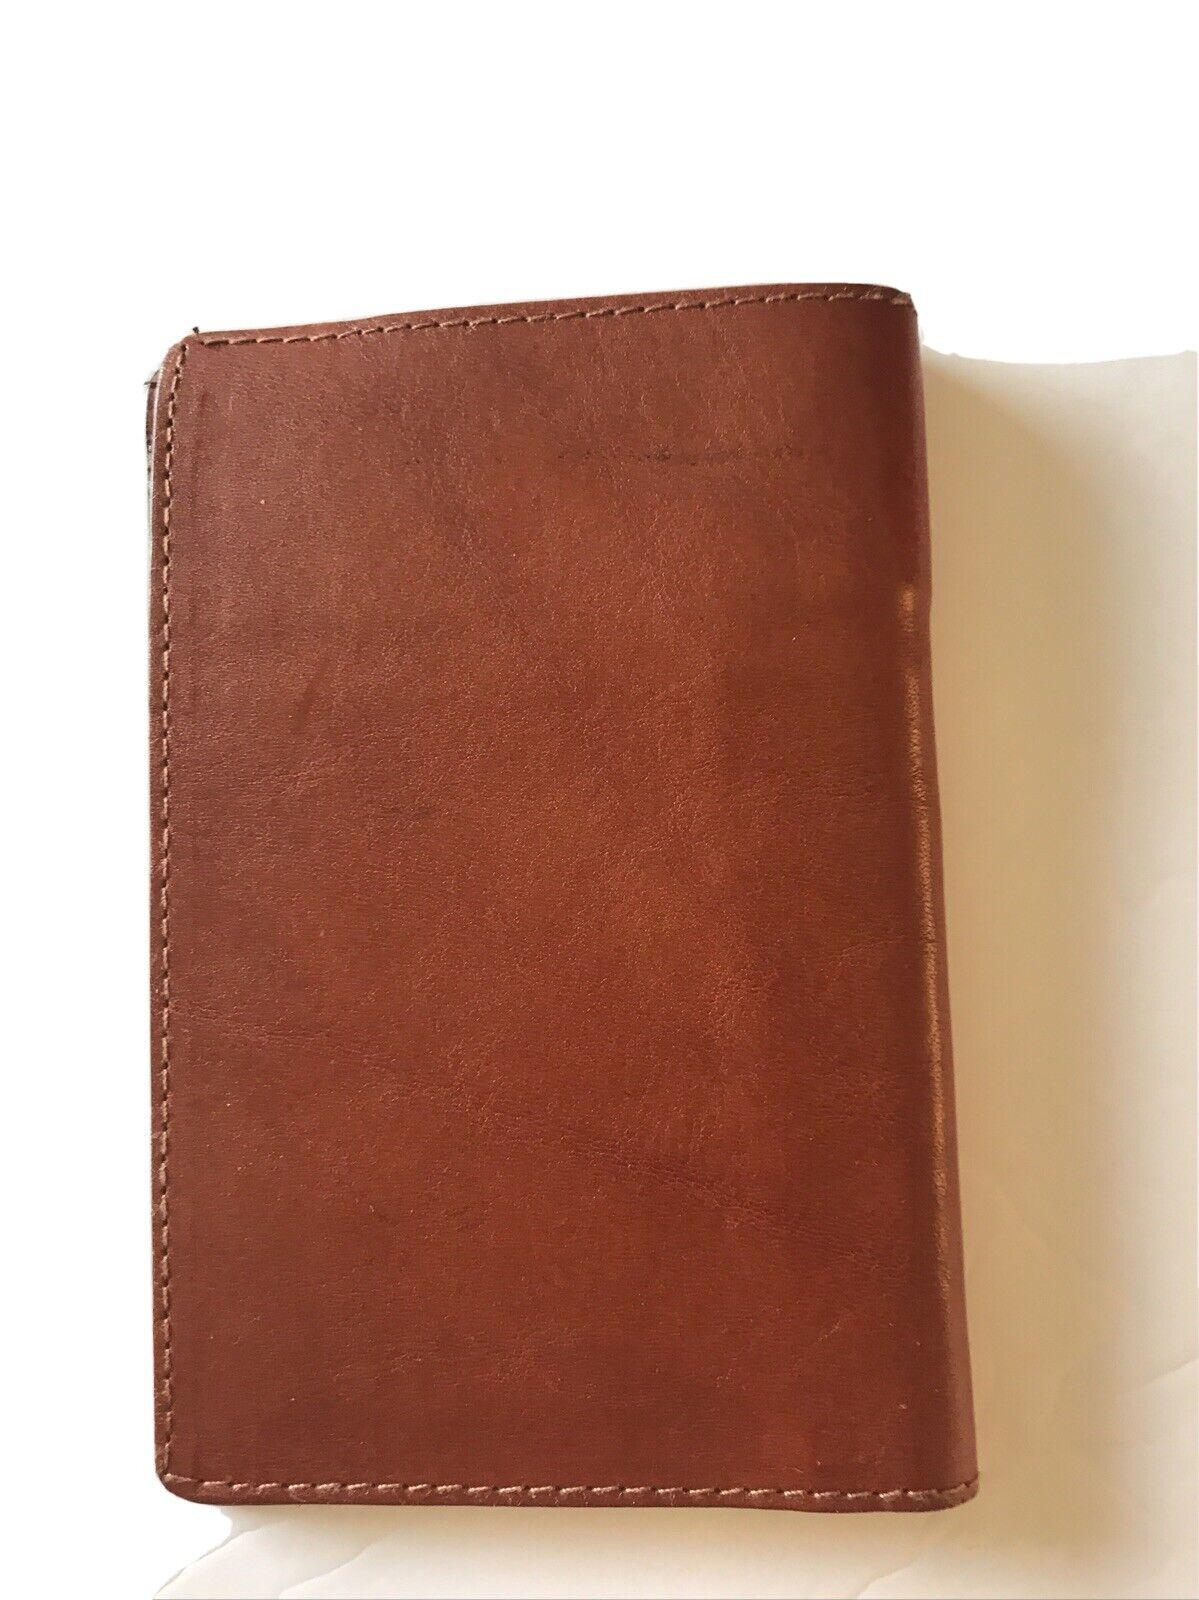 New cognac colored Vesuvius Leather Wallet